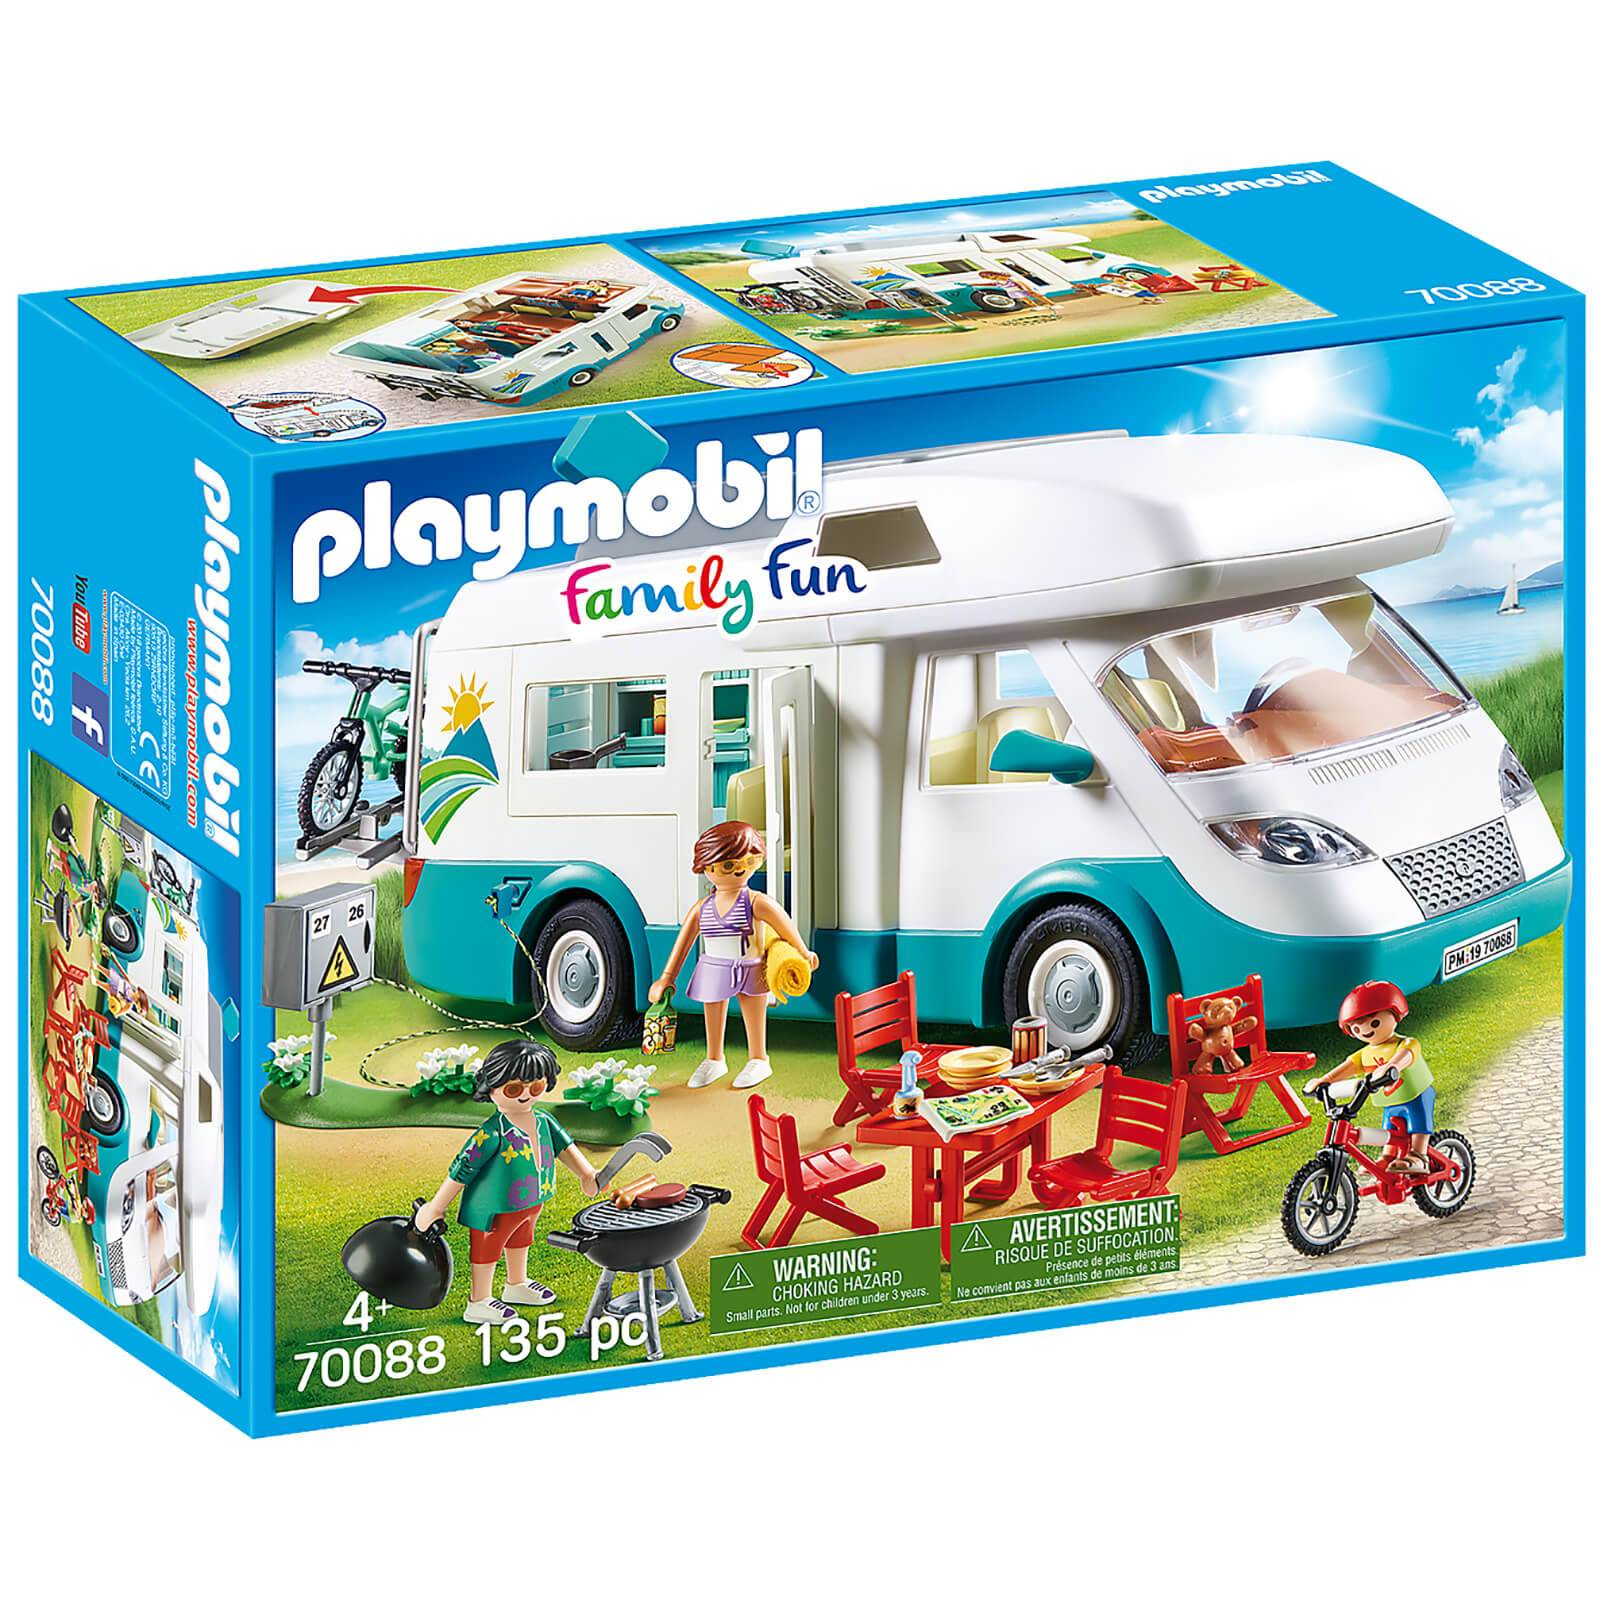 Playmobil Family Fun Family Camper (70088)